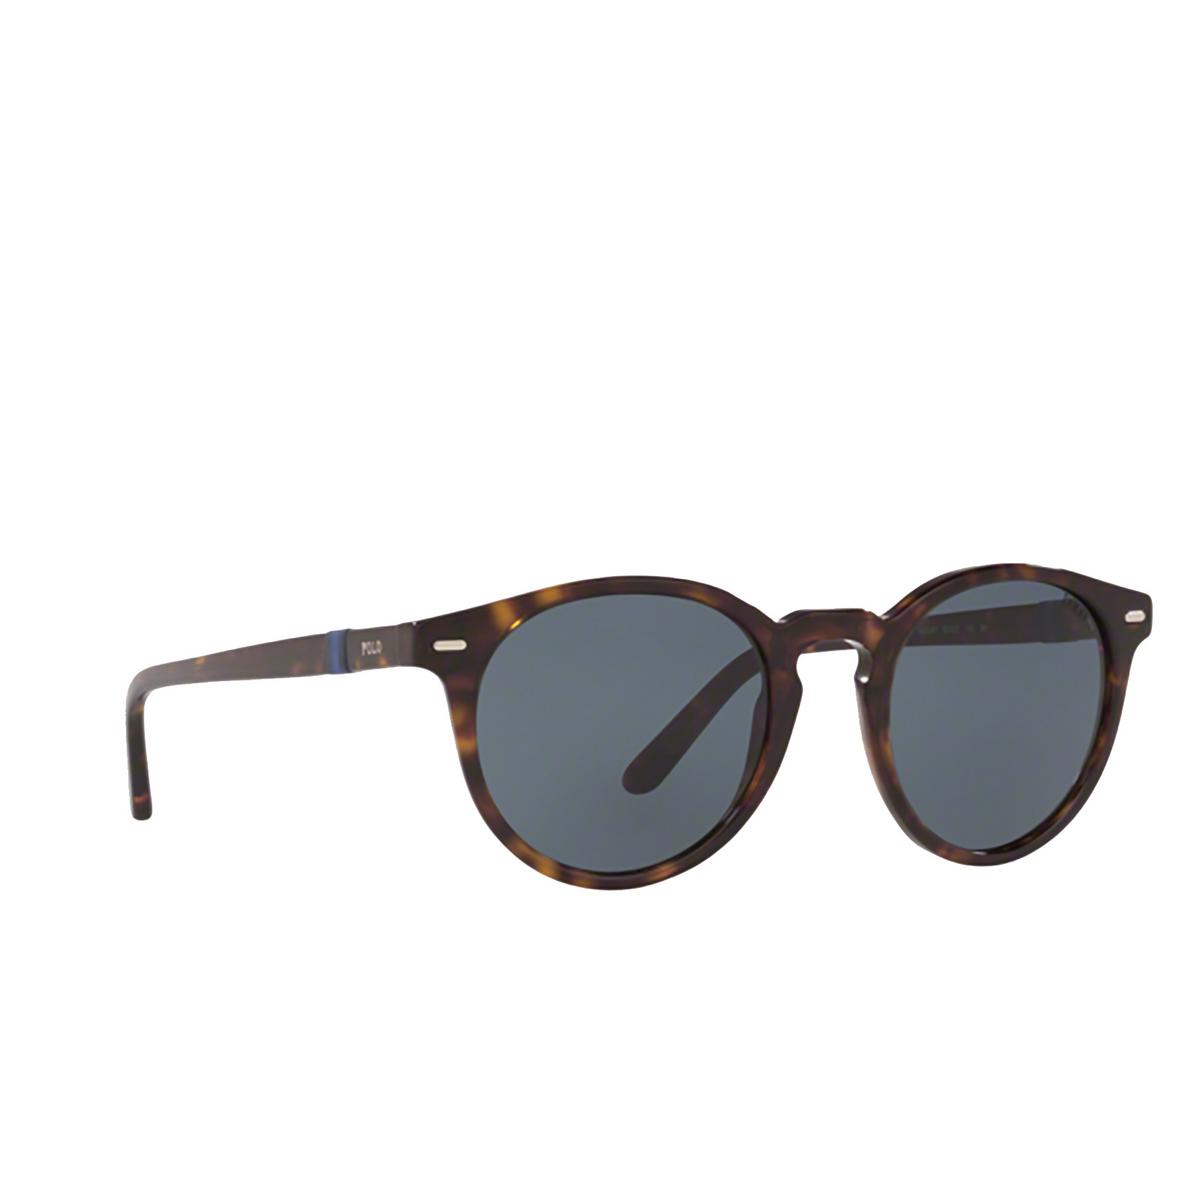 Polo Ralph Lauren® Round Sunglasses: PH4151 color Shiny Dark Havana 500387 - three-quarters view.